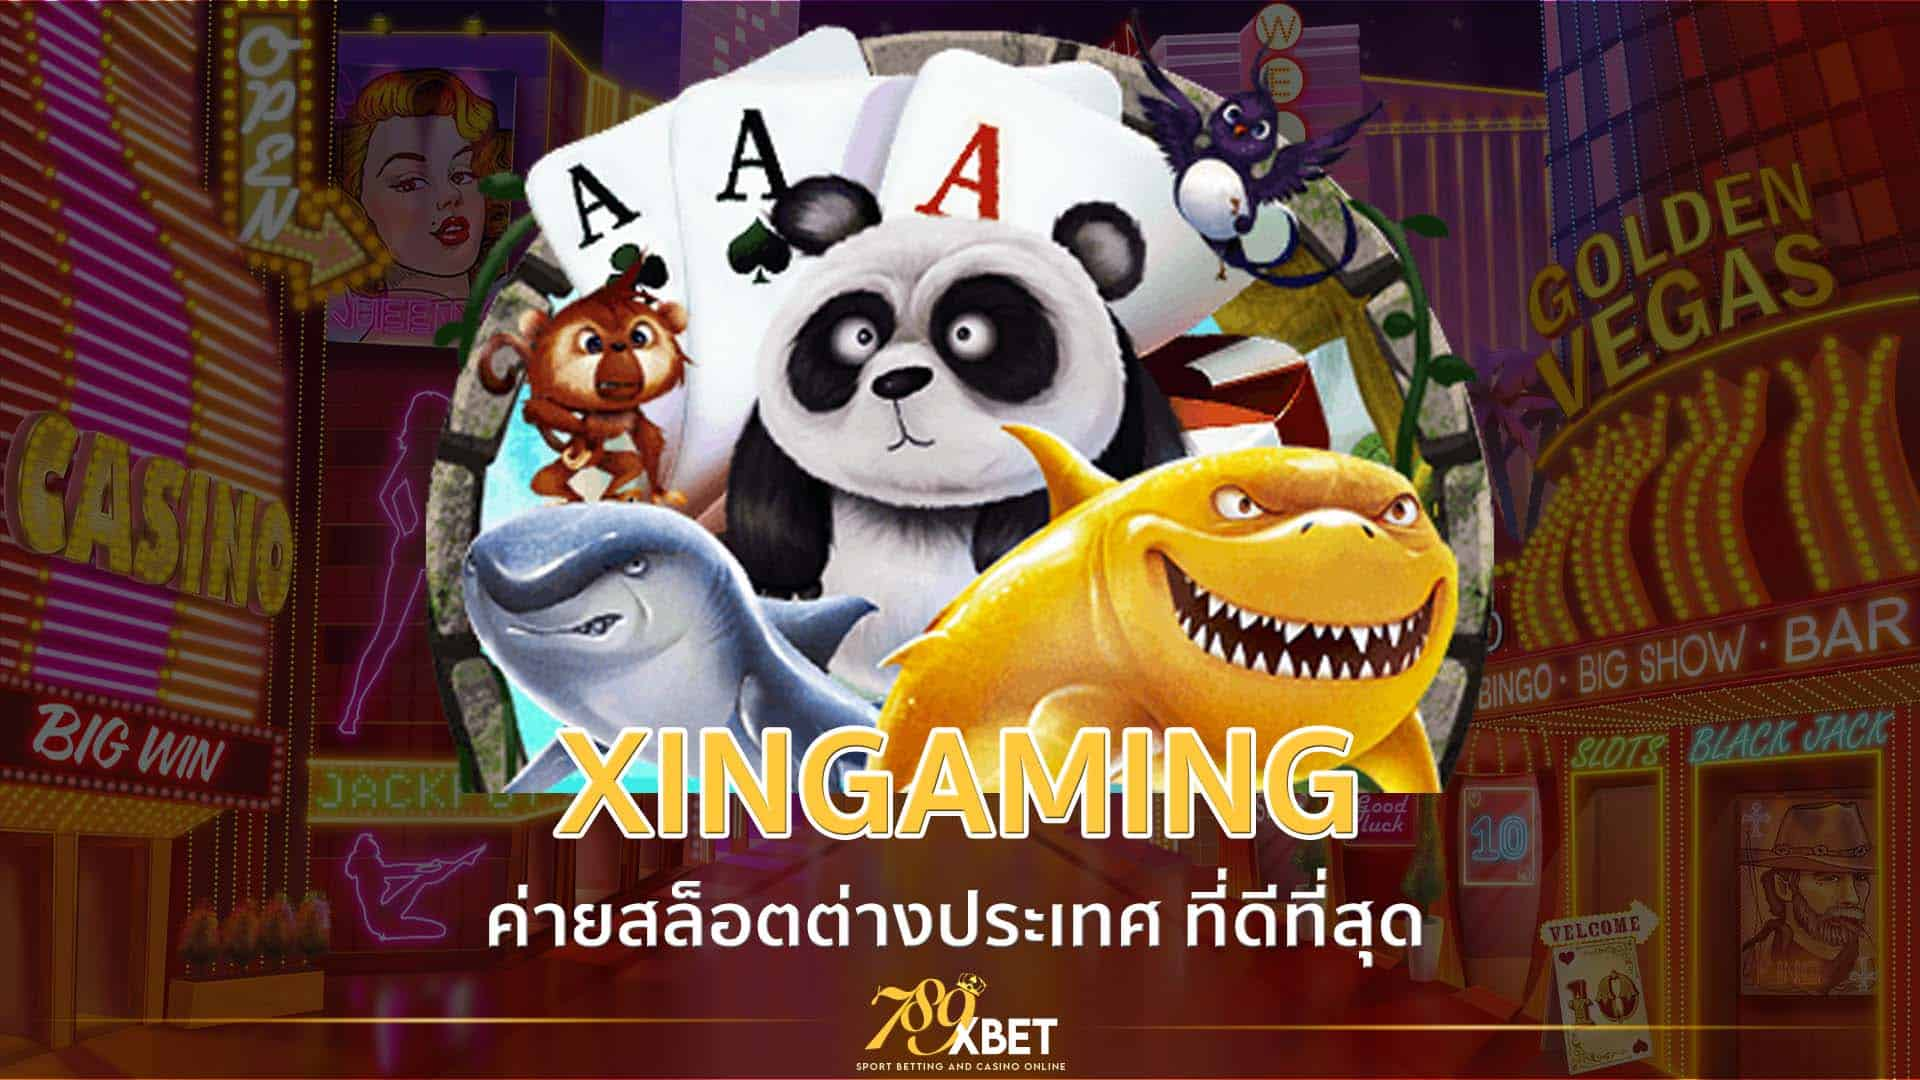 XIN GAMING ค่ายสล็อตเปิดใหม่ 2021